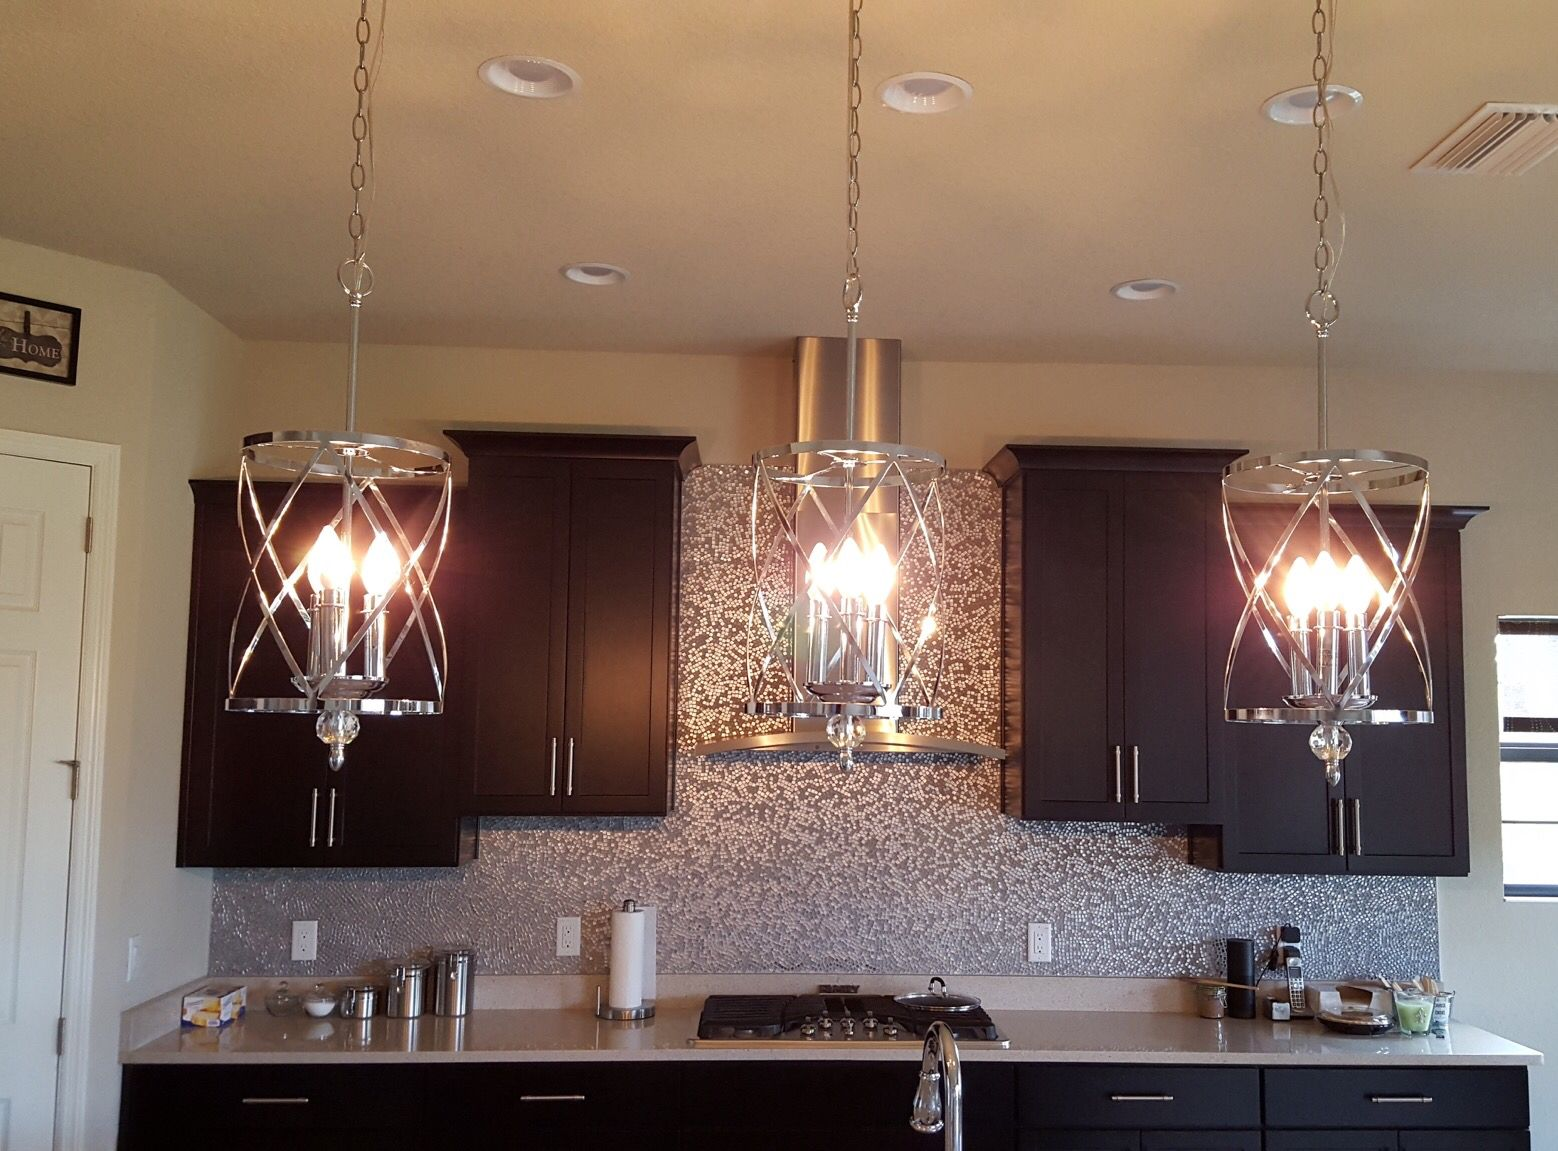 Canarm vanessa 3 light chandelier love my pendant lights canarm vanessa 3 light chandelier love my pendant lights arubaitofo Images